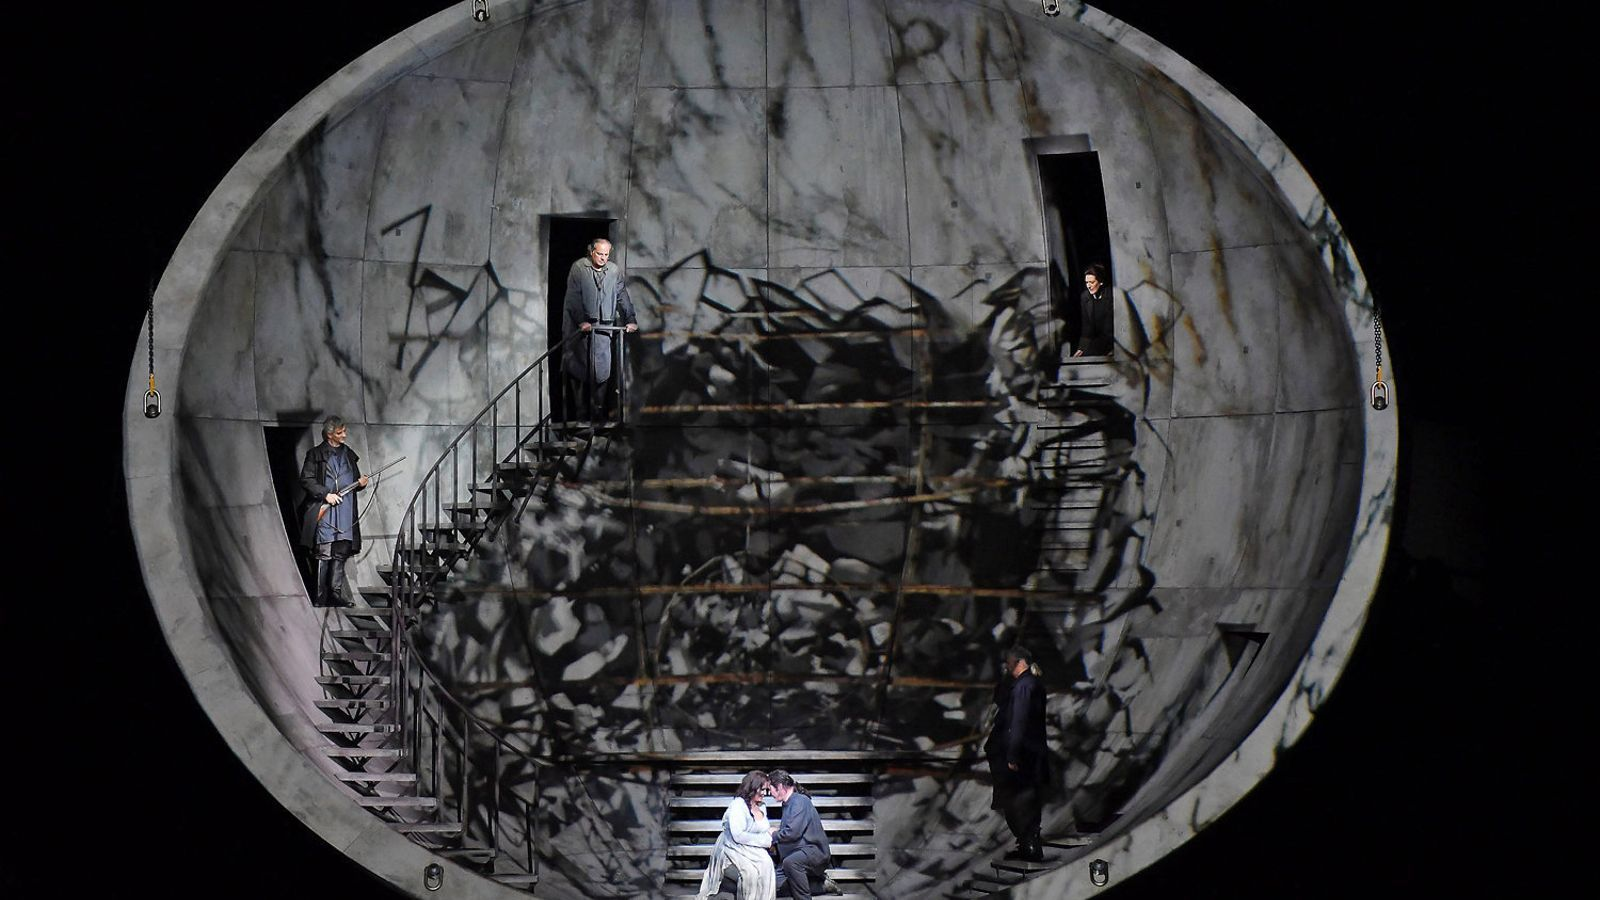 Iréne Theorin i Stefan Vinke, a la part inferior de la gran esfera d'aquesta Tristan und Isolde.